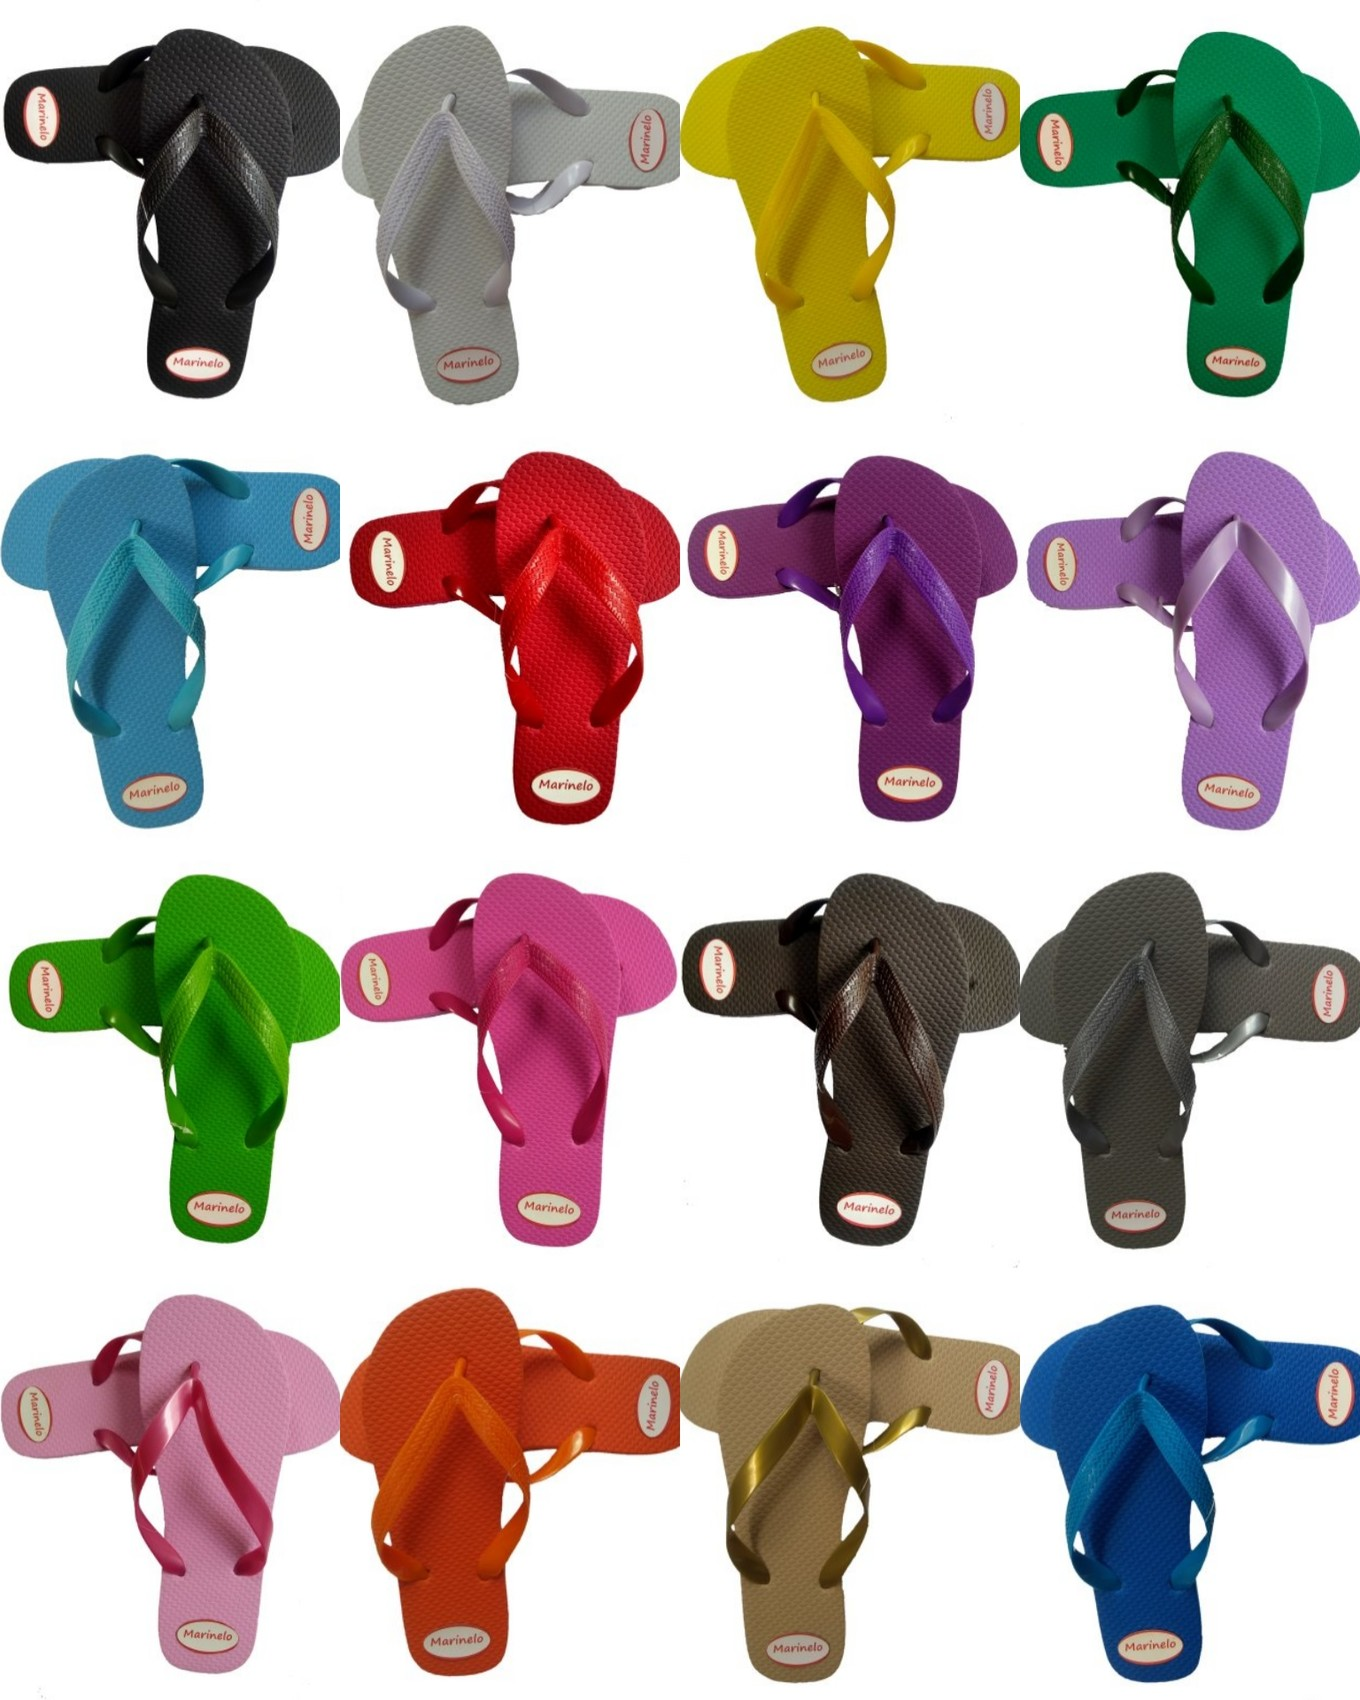 8c0cf4ea401436 Kit 50 pares chinelo Sandália rasteira para personalizar Silk strass  Sublimar